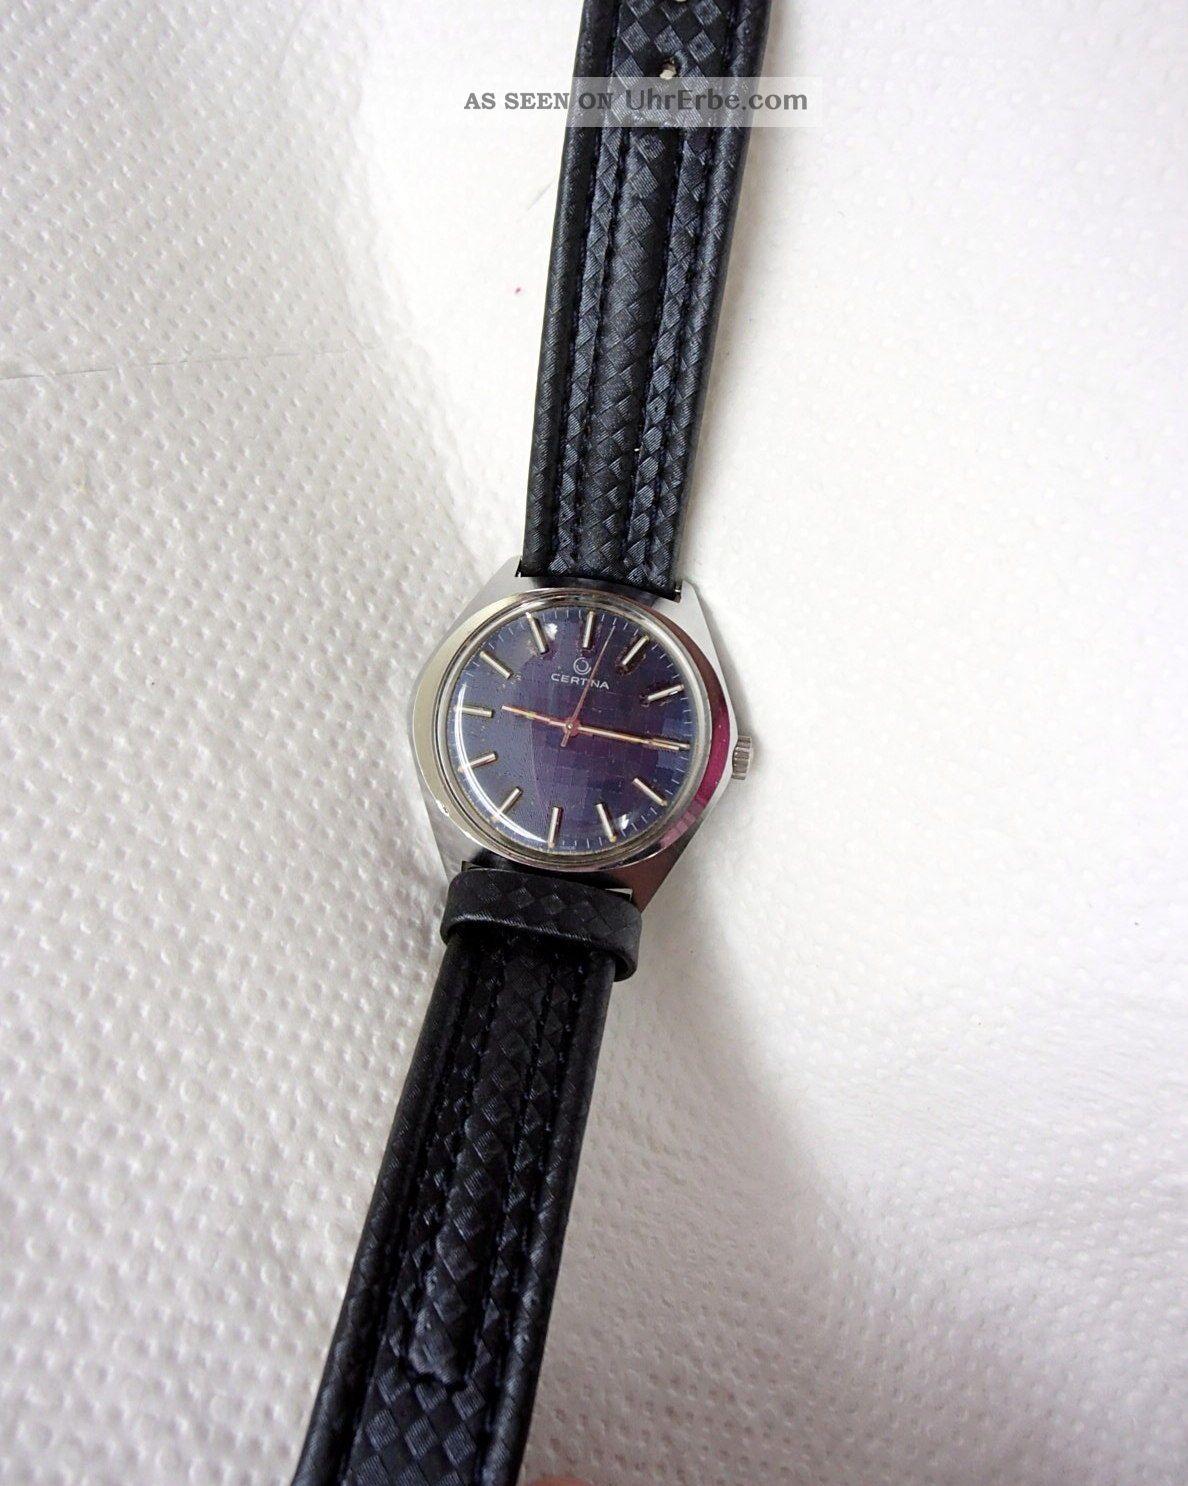 Certina Herrenarmbanduhr.  Kaliber 25 - 66 Edelstahl 17 Jewels Läuft Sofort An Armbanduhren Bild